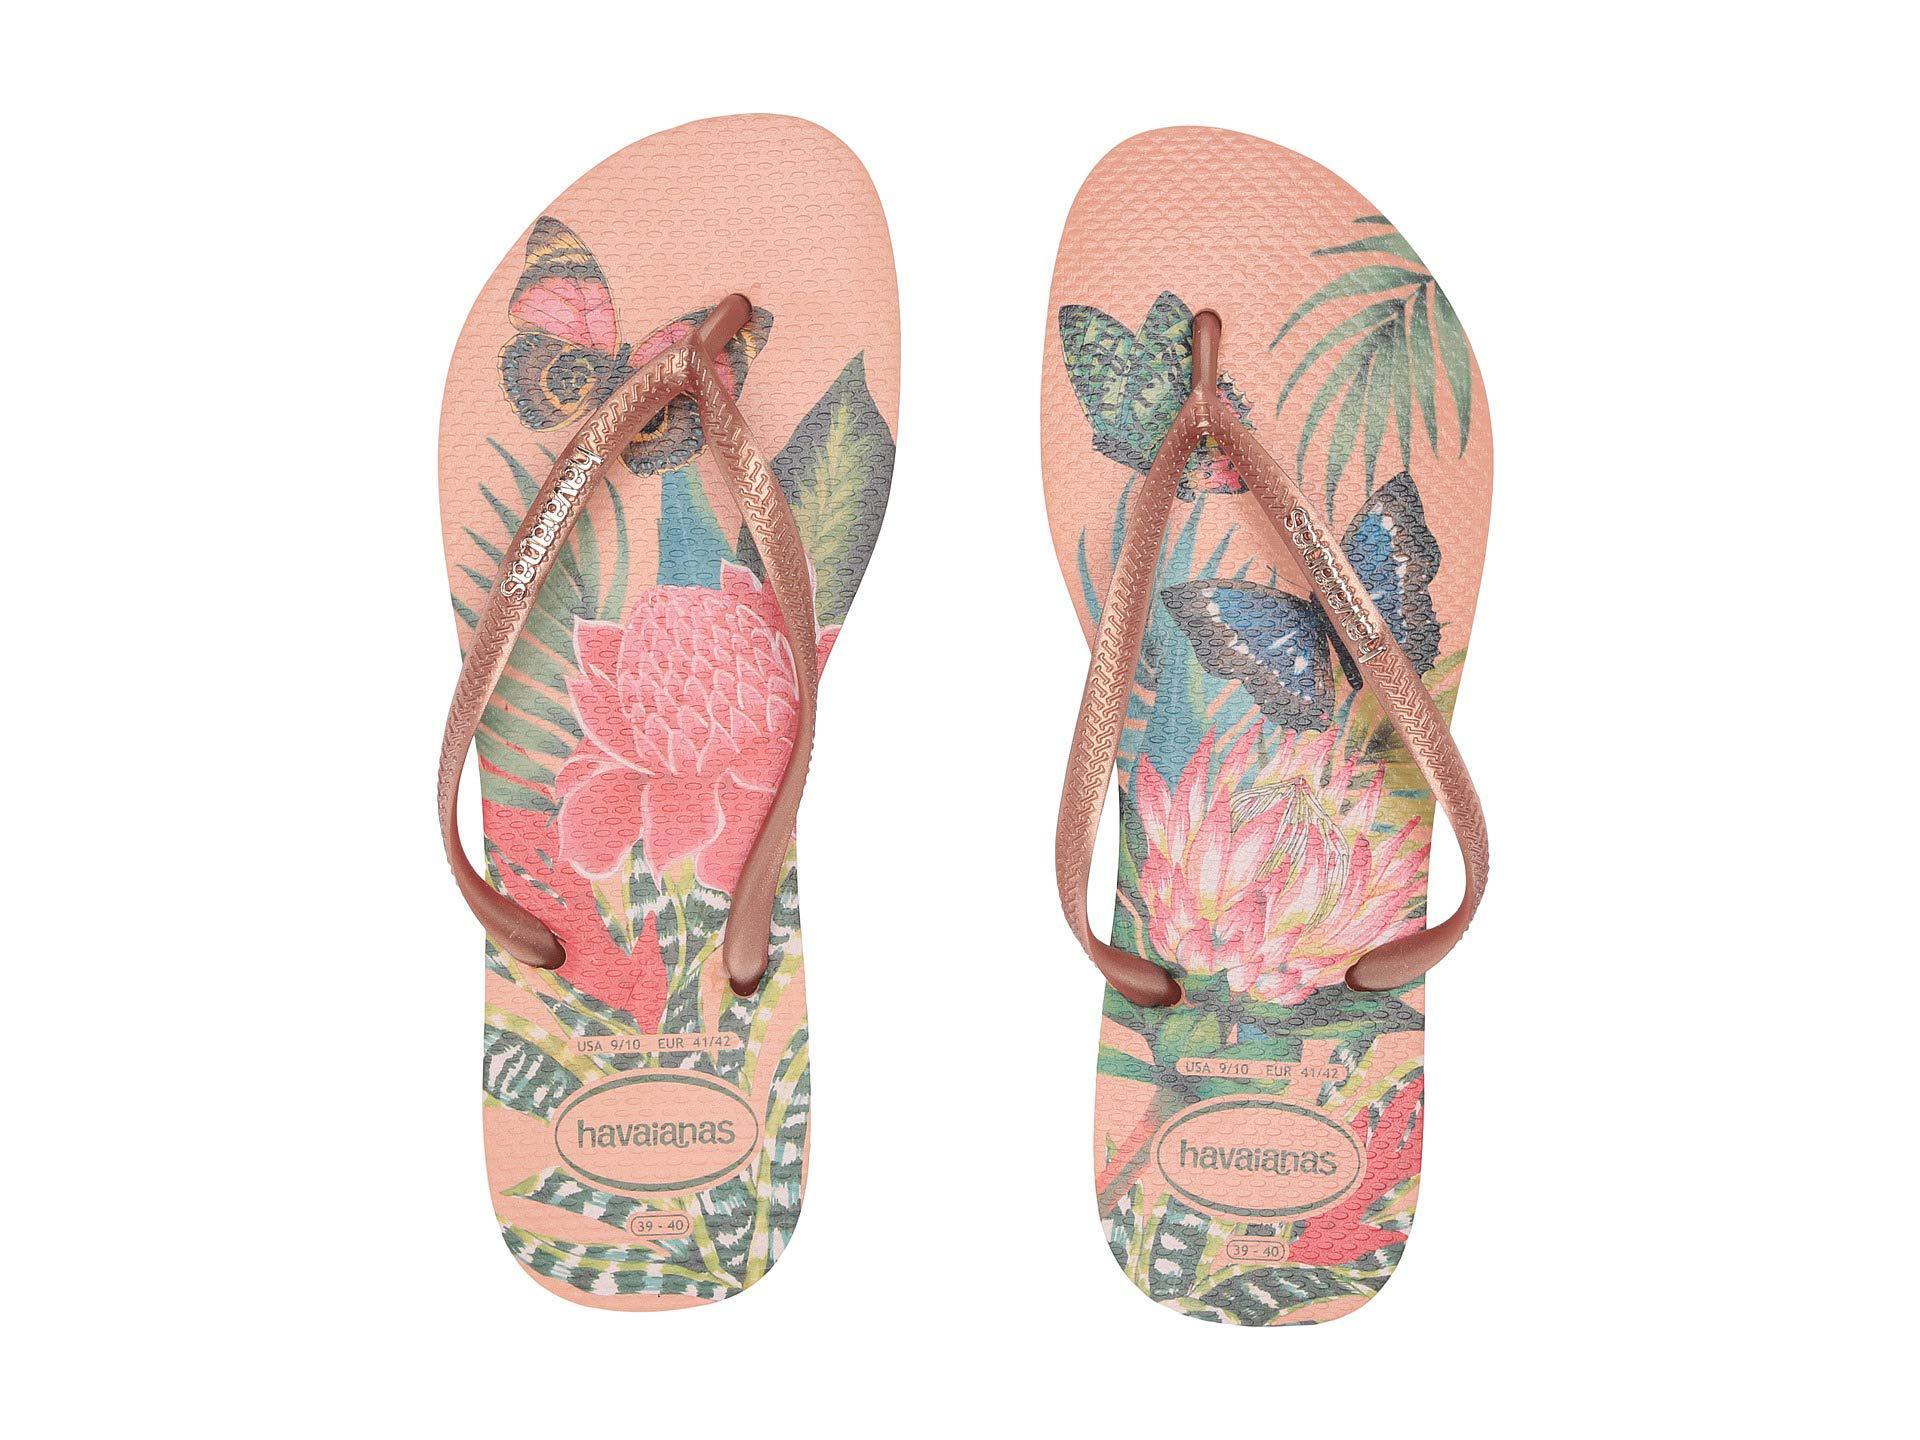 974f7f6dbdc7 Havaianas - Pink Slim Tropical Flip Flops (black graphite) Women s Sandals  - Lyst. View fullscreen